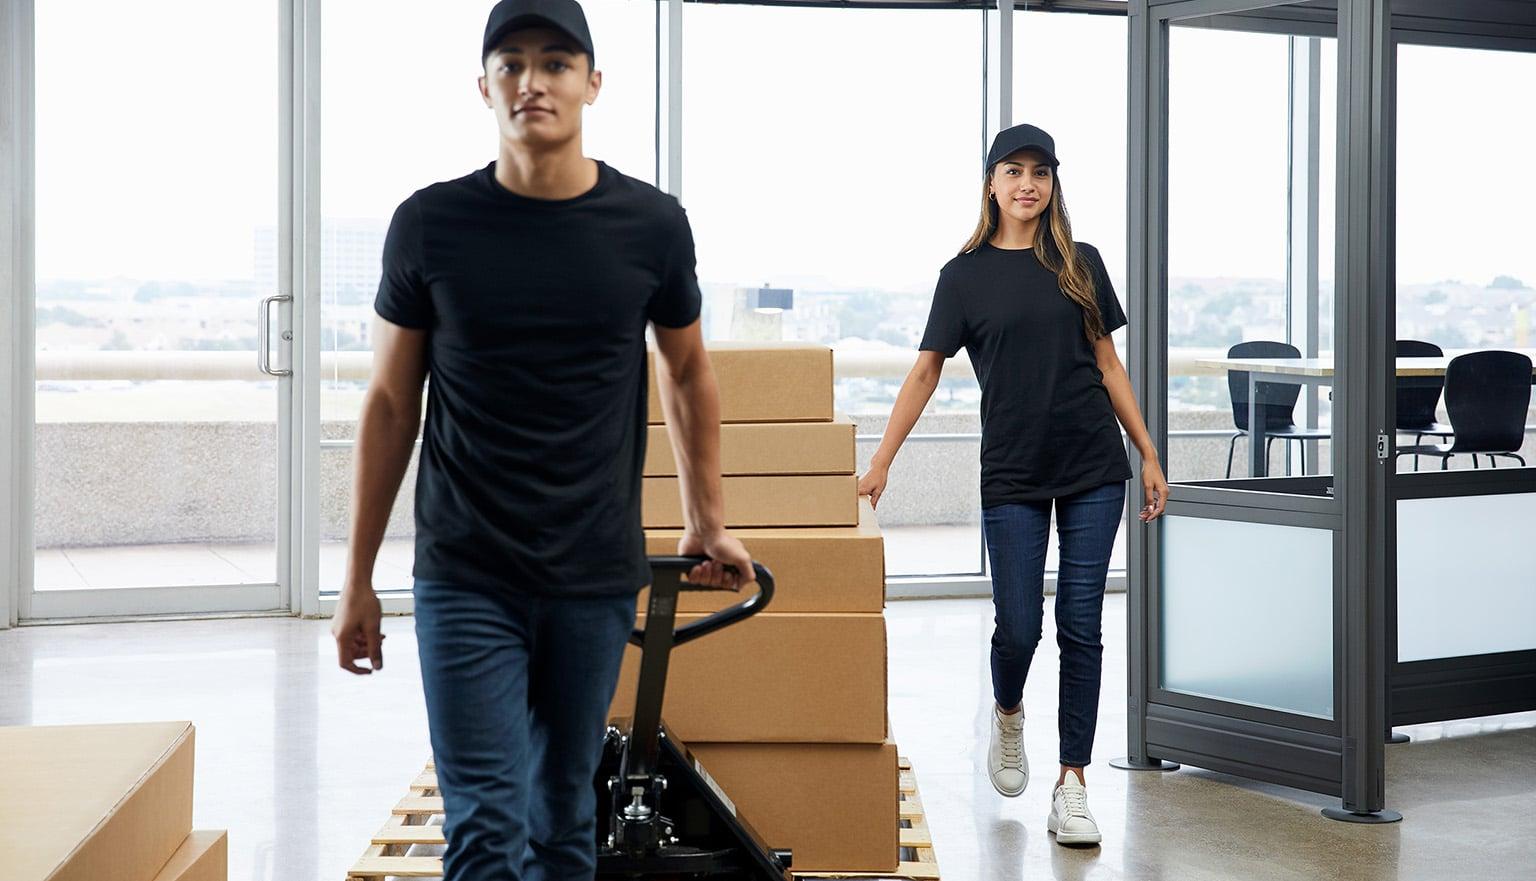 vari install team delivers office furniture